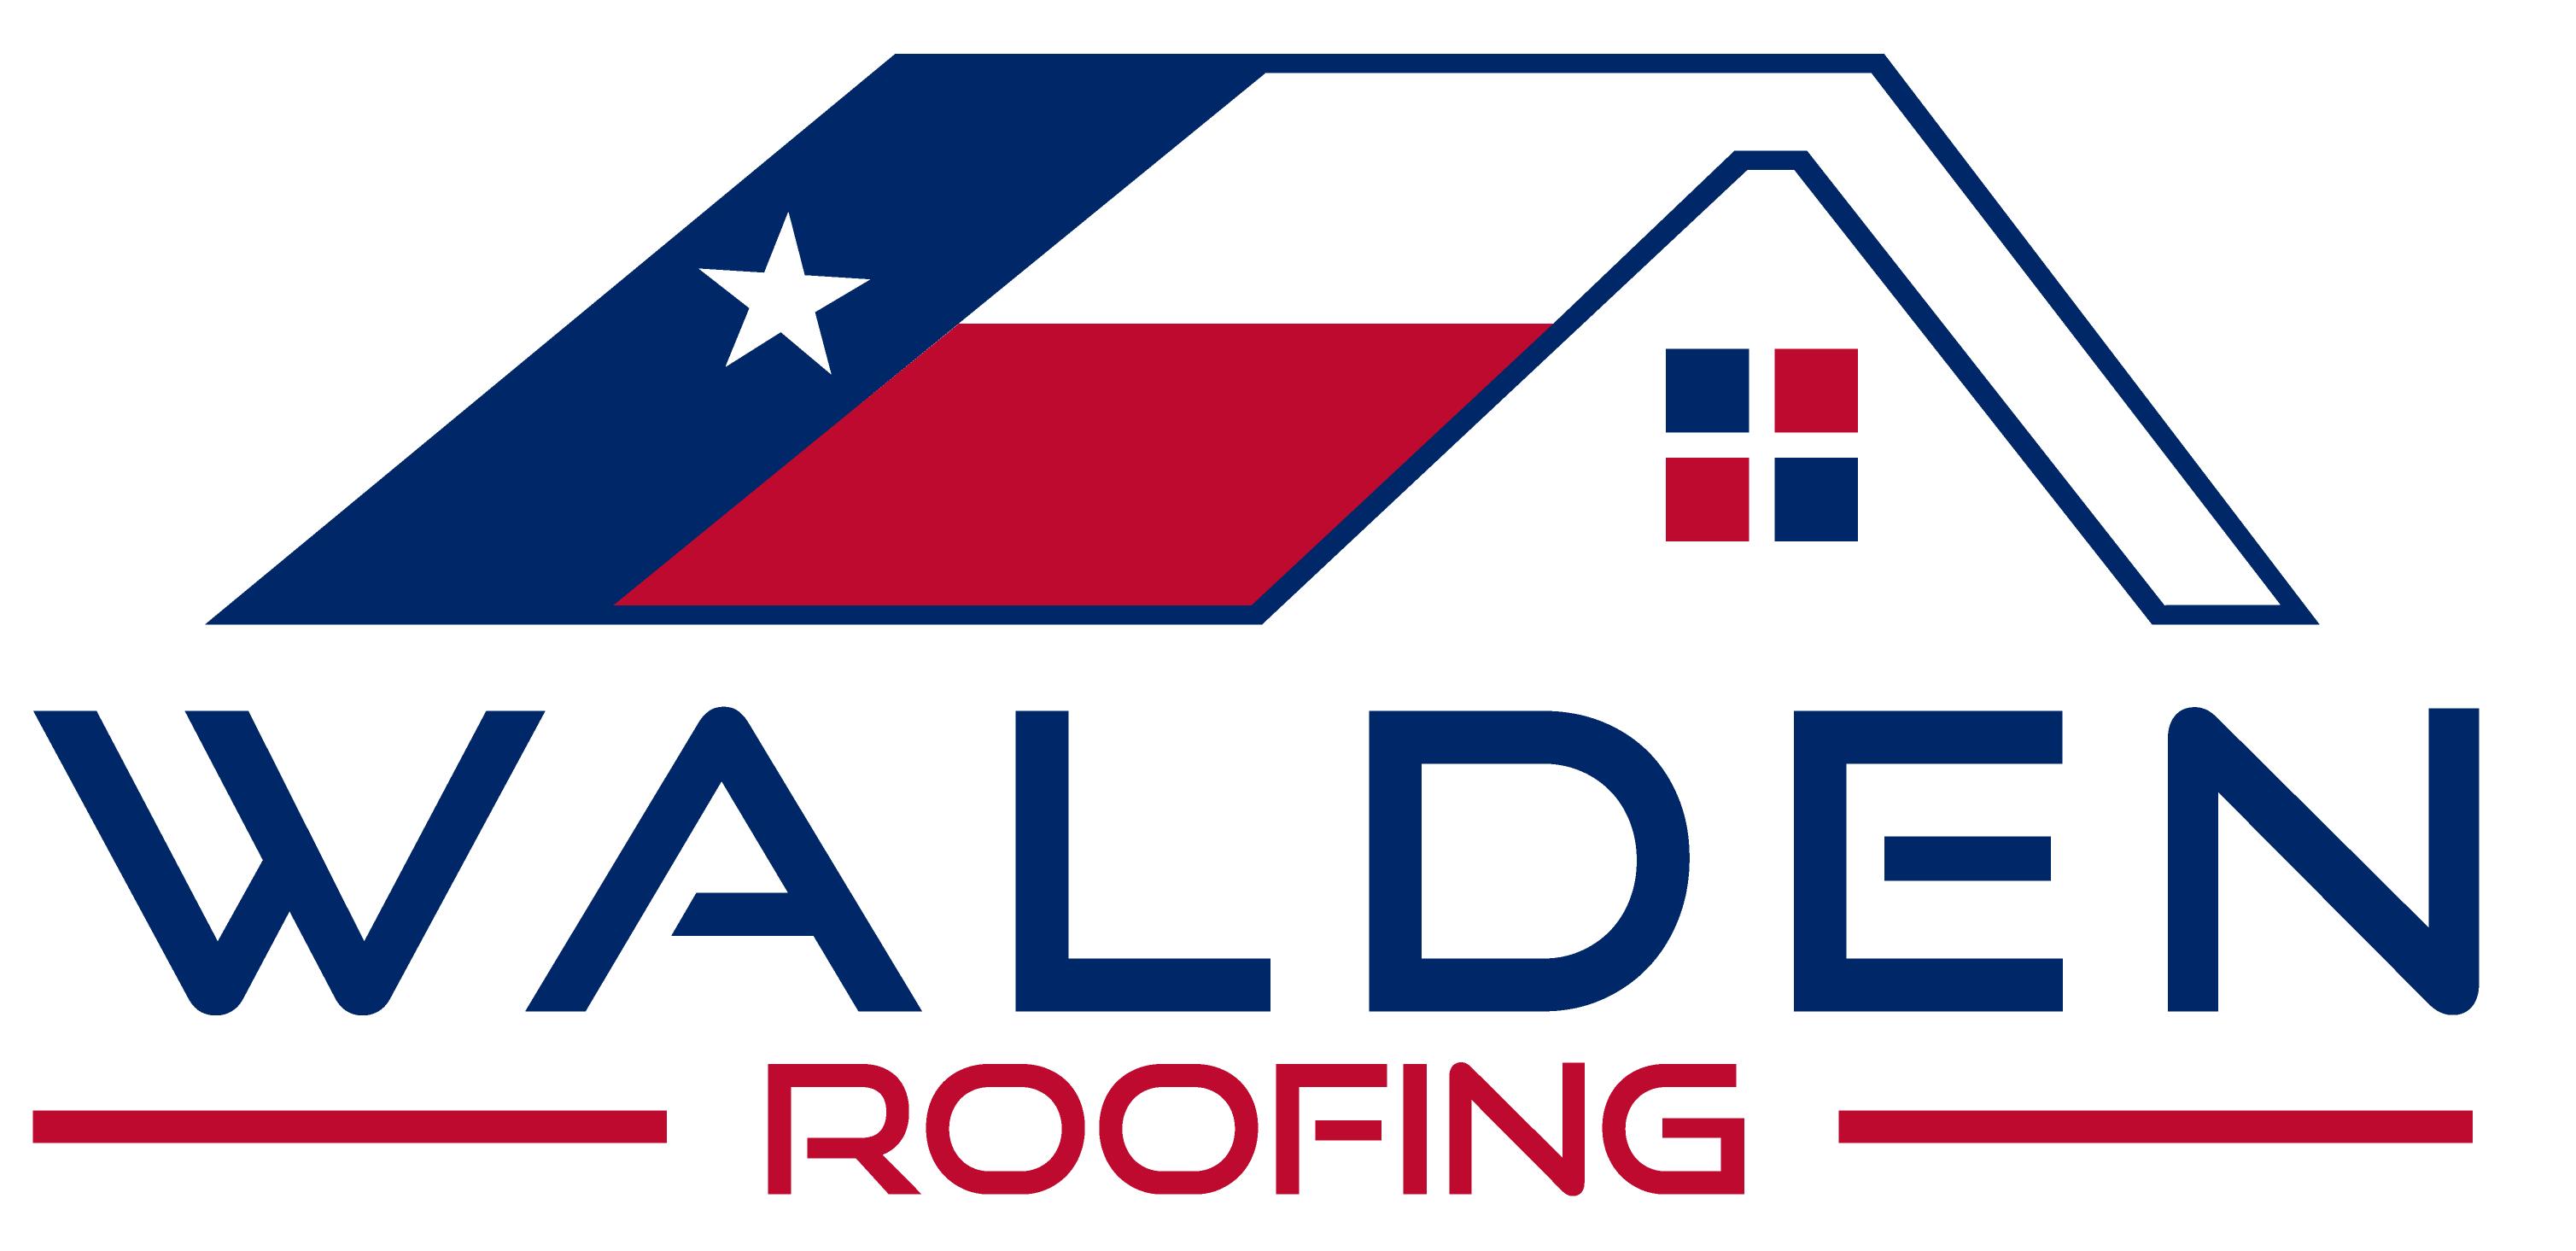 Walden Roofing